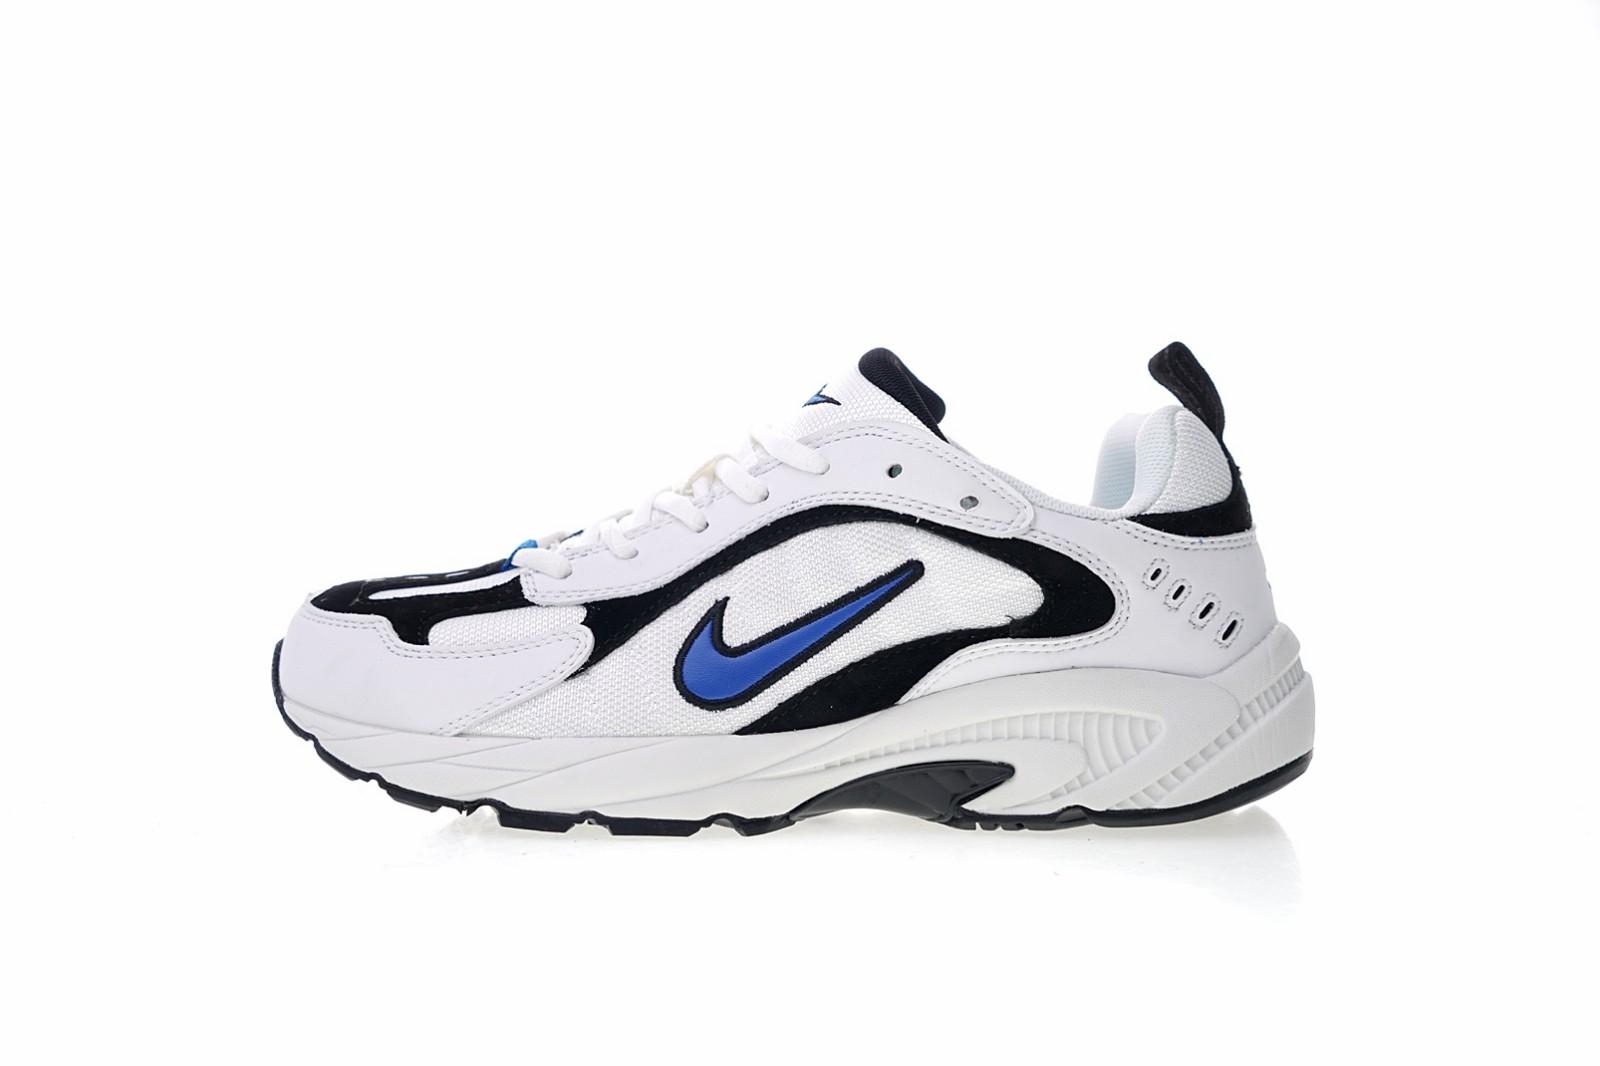 d2681c462 Prev Nike Xccelerator 2001 White Royal Blue Black Retro Casual Daddy Shoes  307491-063